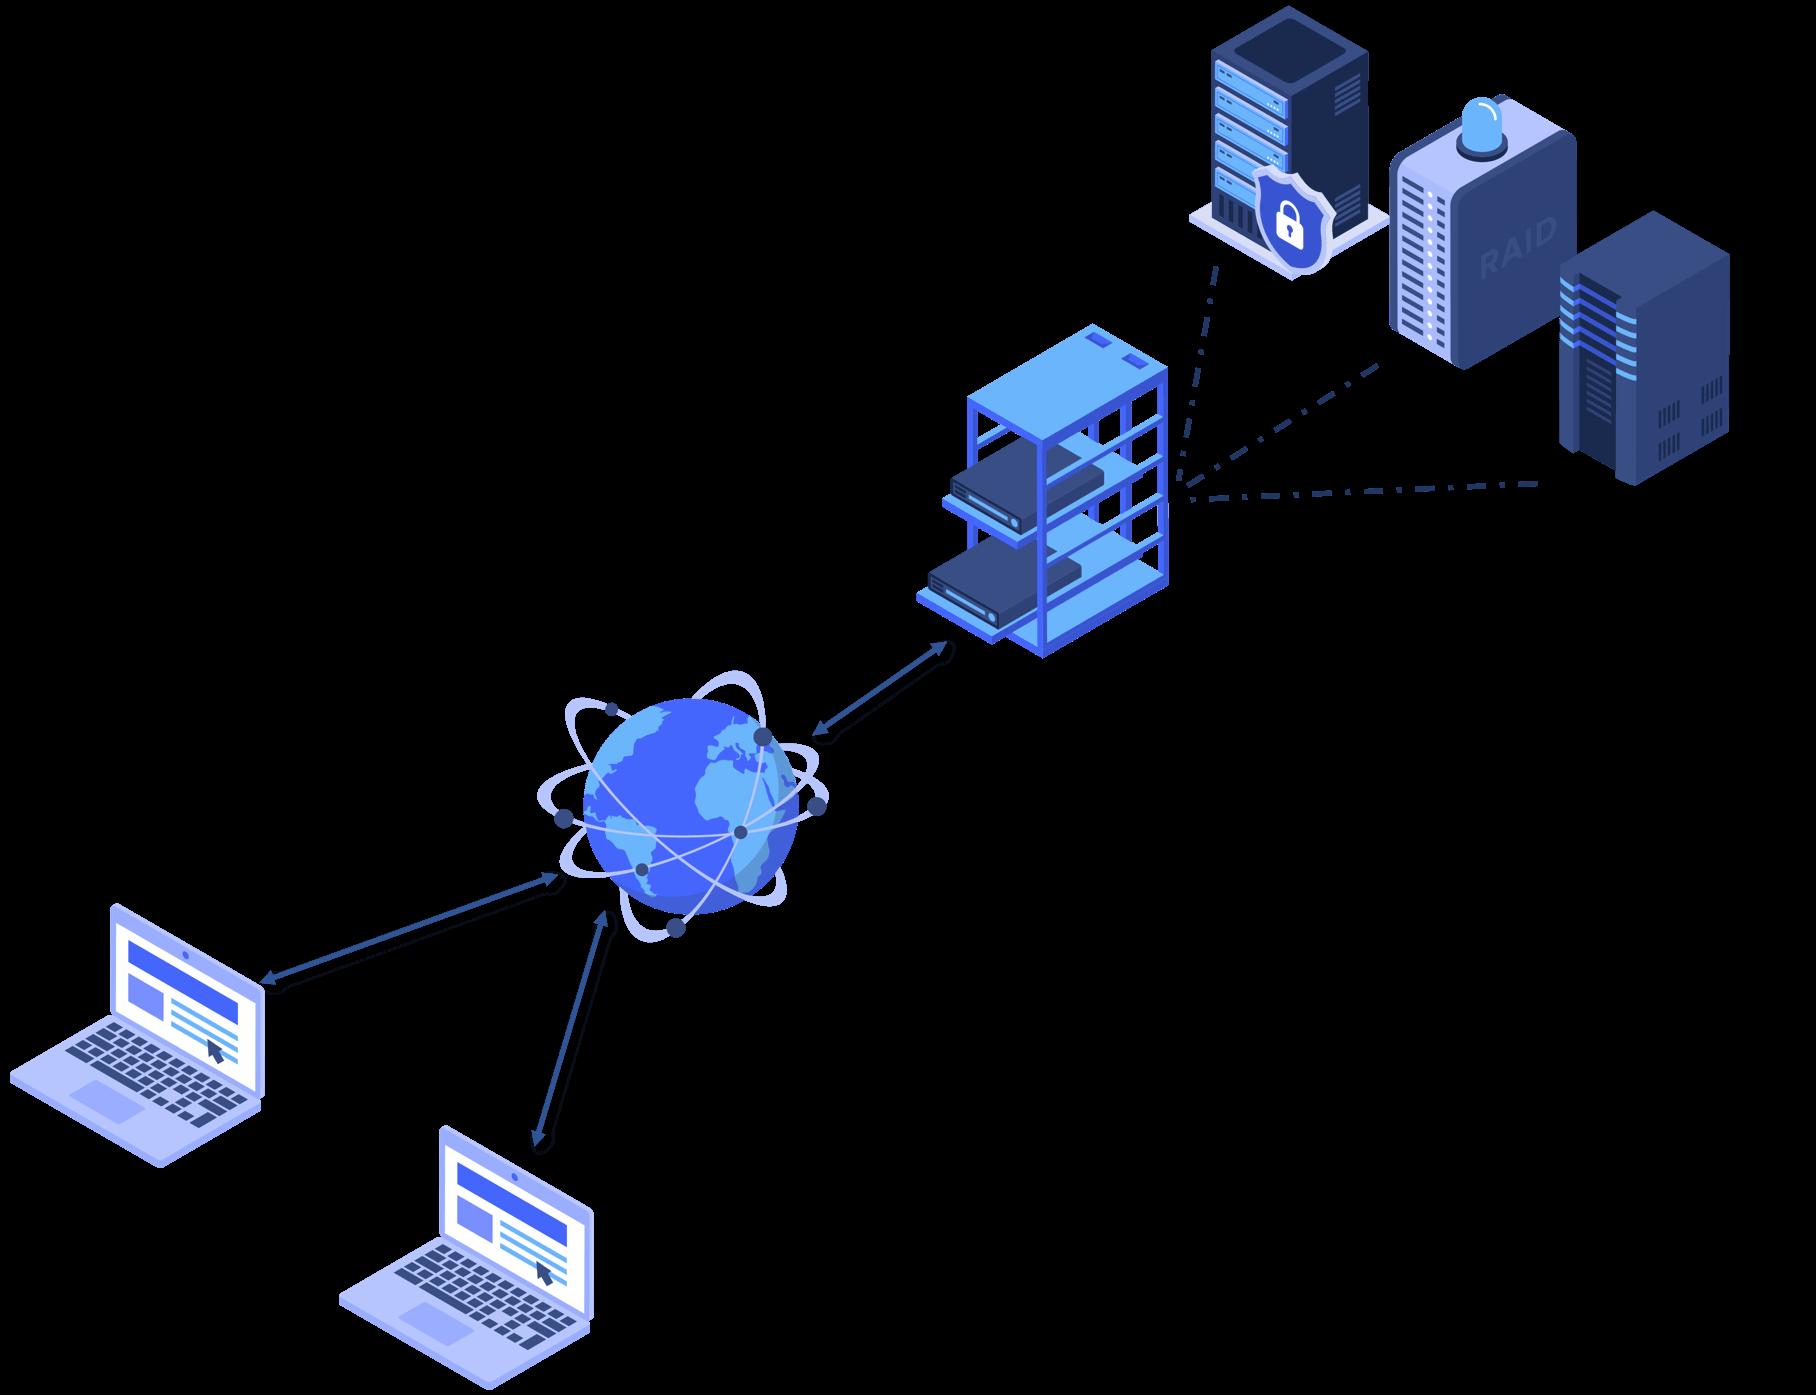 TLS-Proxy und Load Balancing